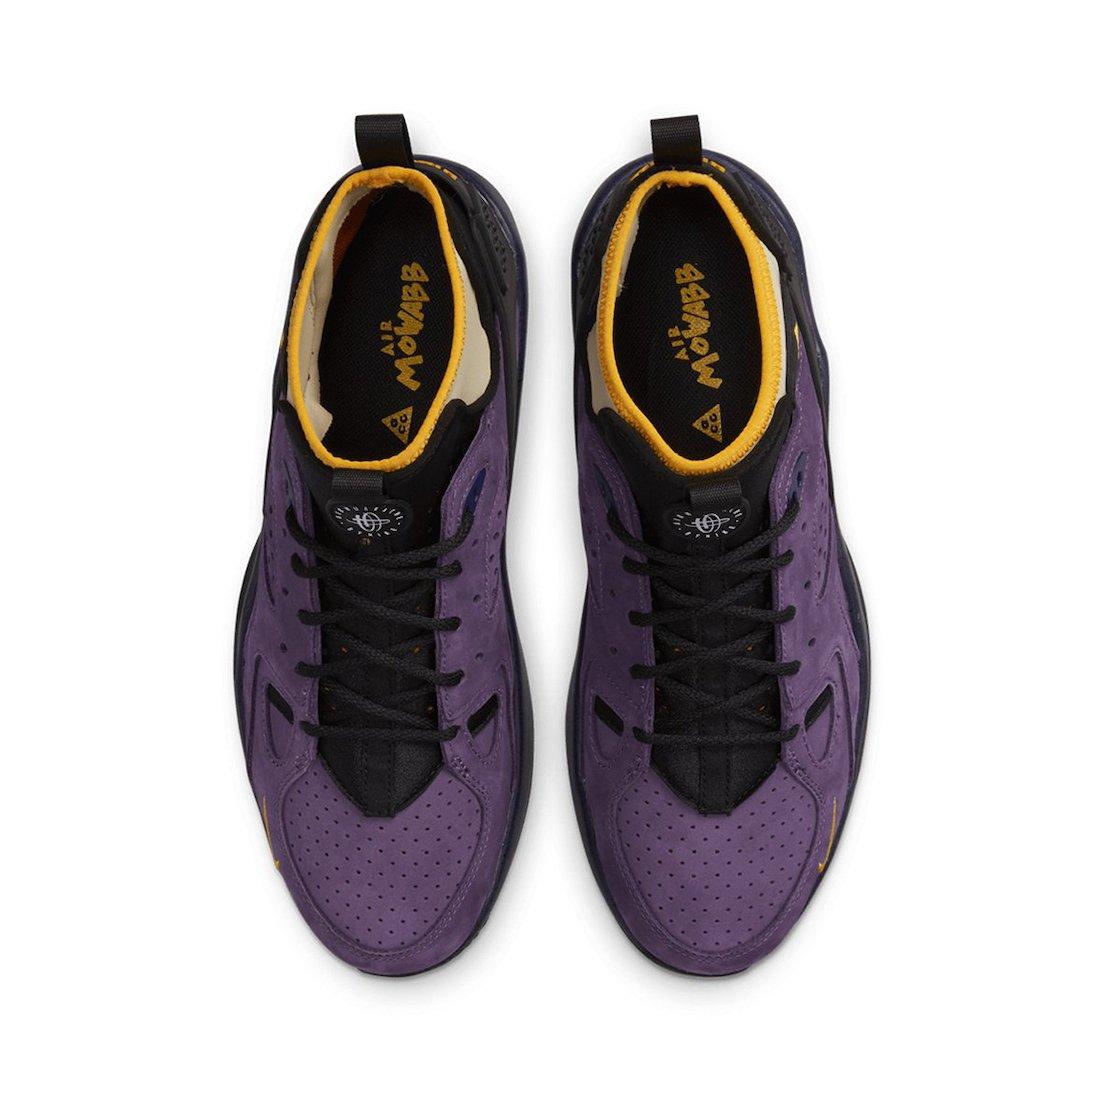 Nike ACG Air Mowabb Gravity Purple DC9554-500 Release Date Info